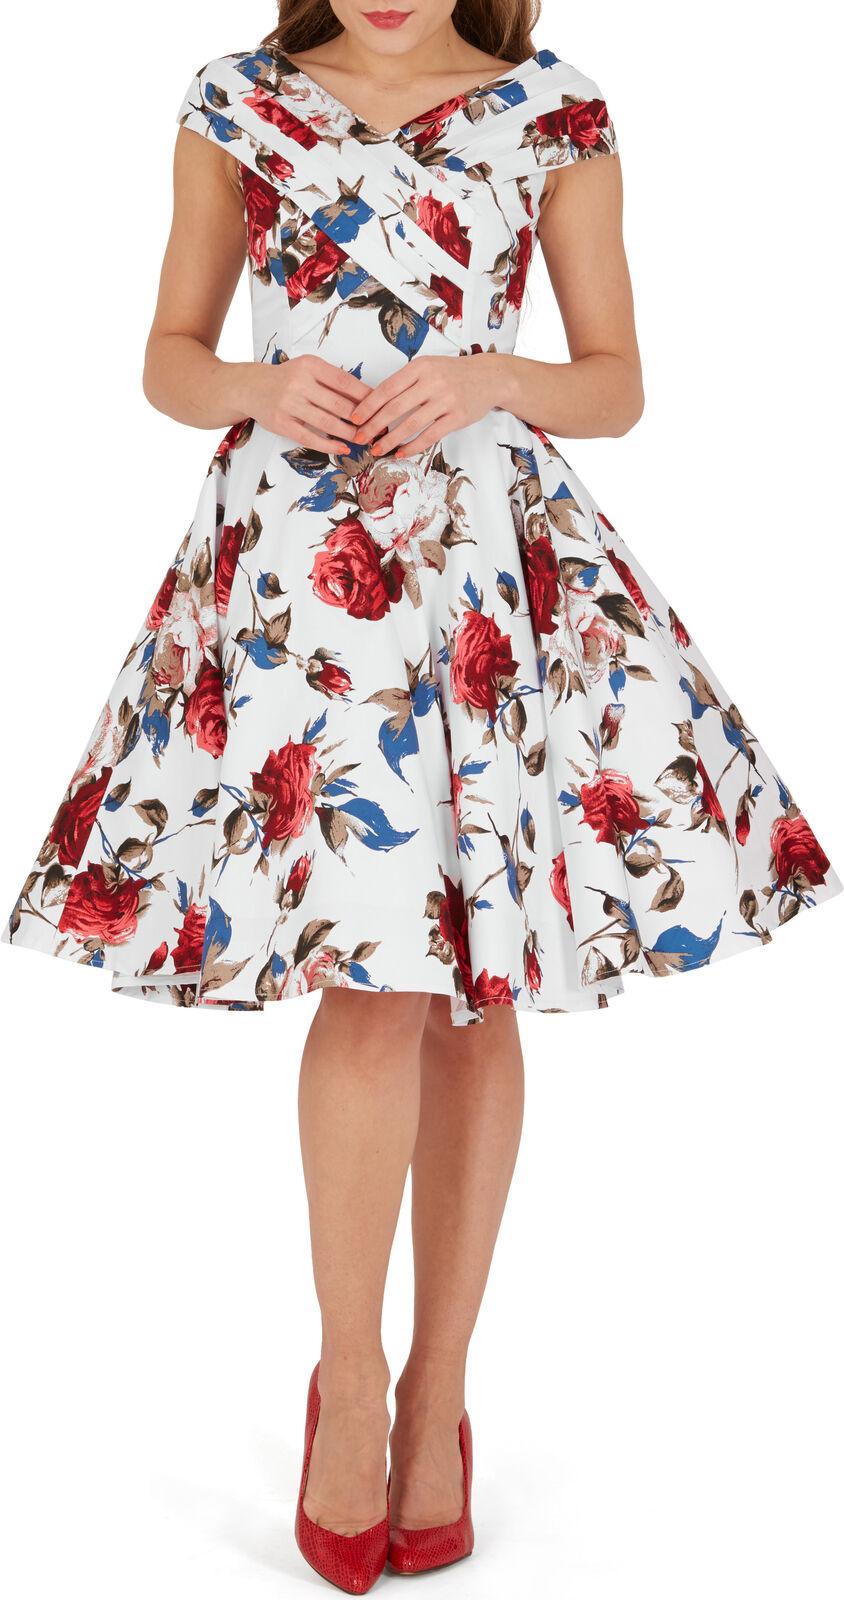 Belle  enya  vintage mercy rétro années 50 rockabilly soirée swing robe